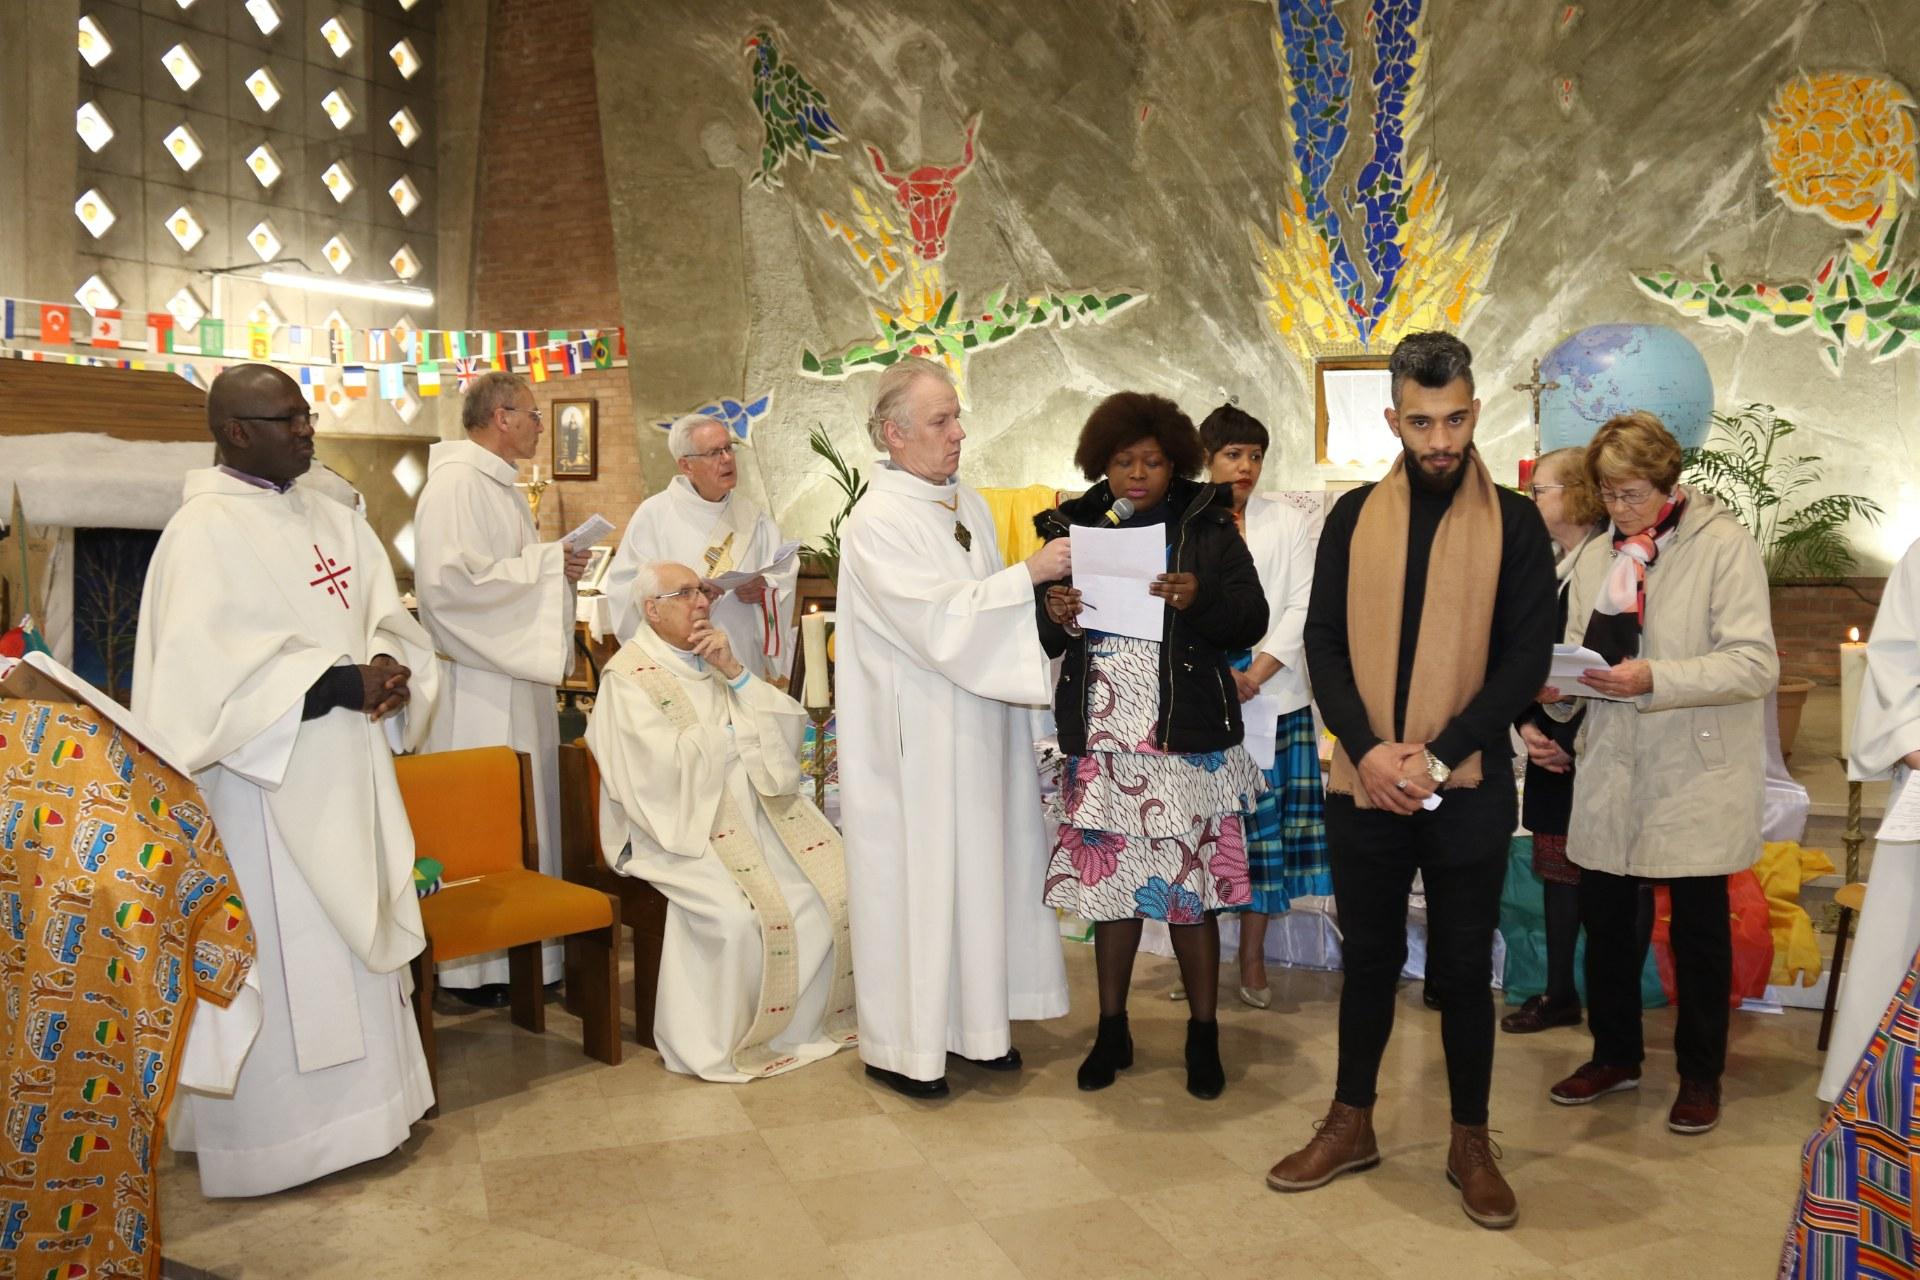 Messe des Nations 50